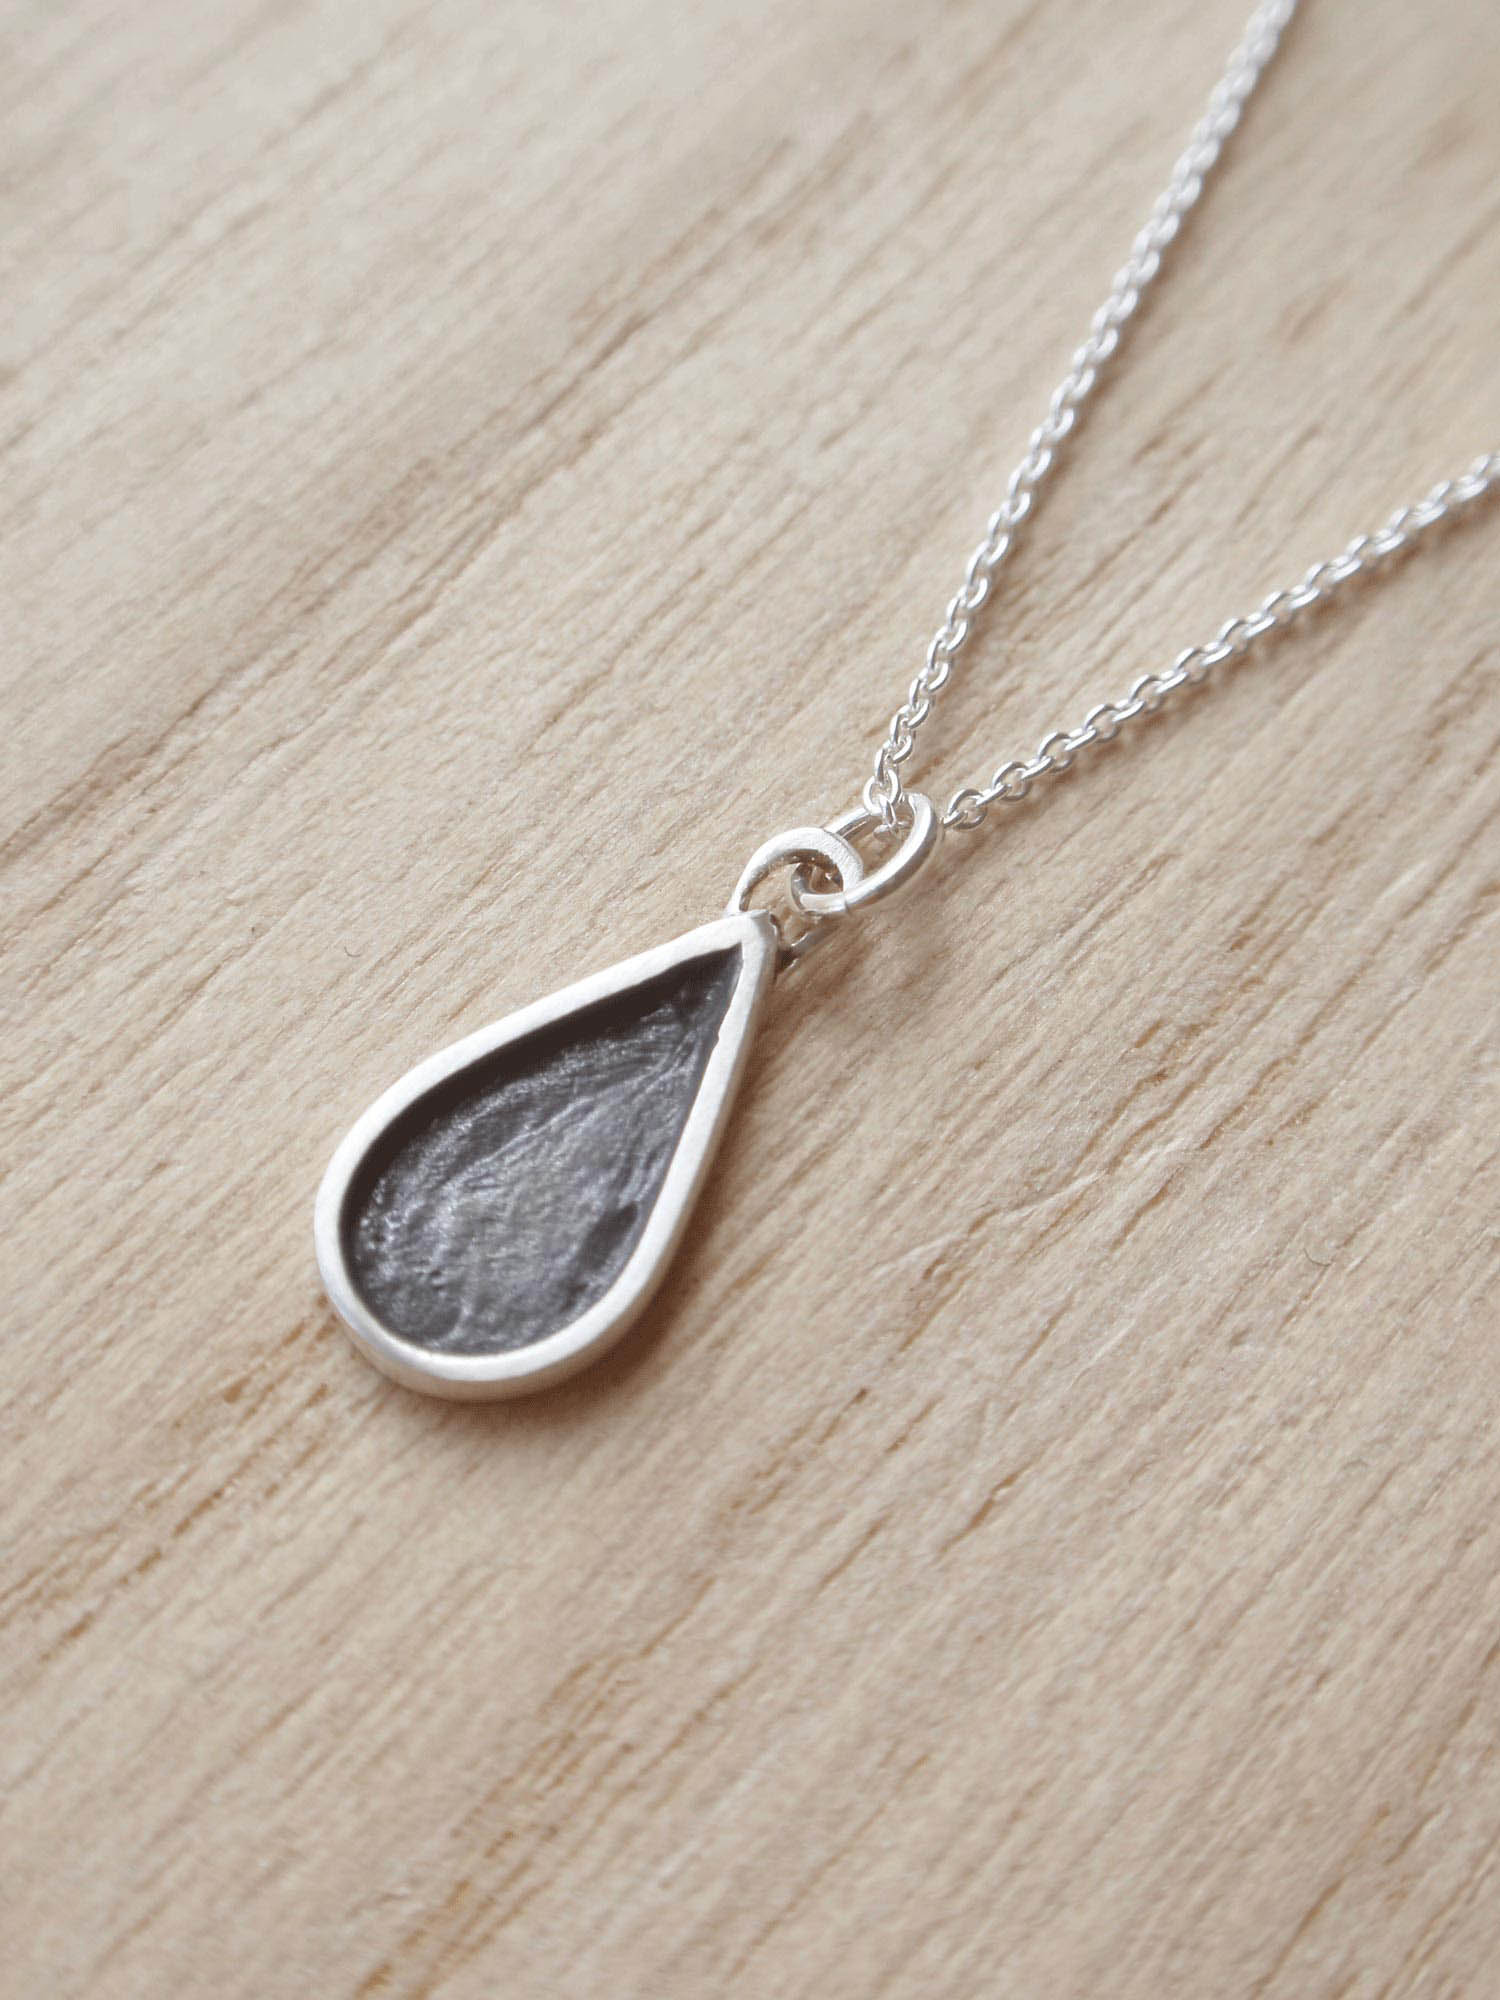 Image of Black Teardrop Necklace